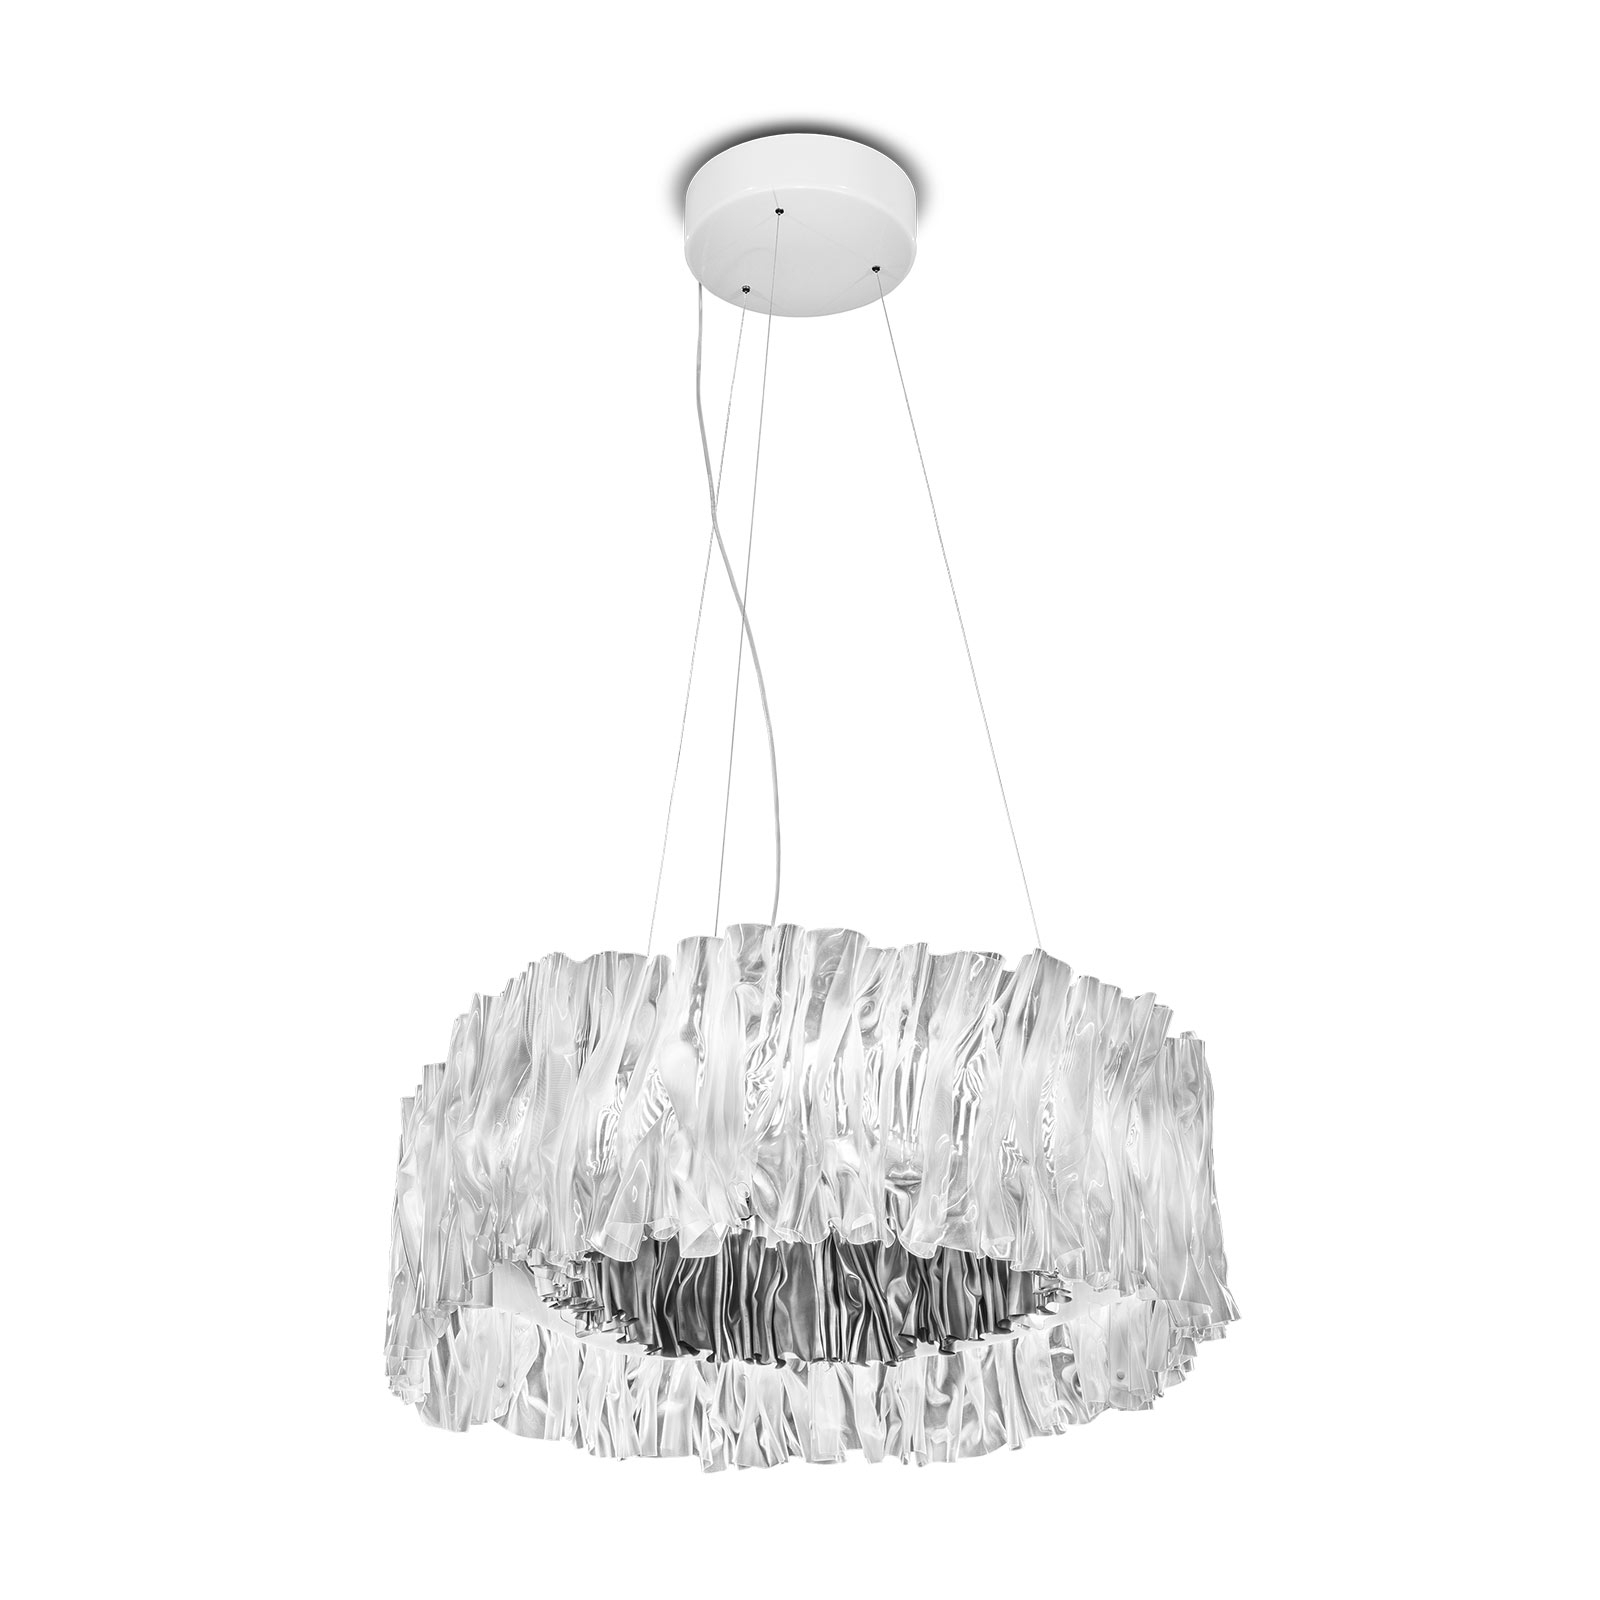 Slamp Accordéon LED-riippuvalaisin hopea, 2°700°K